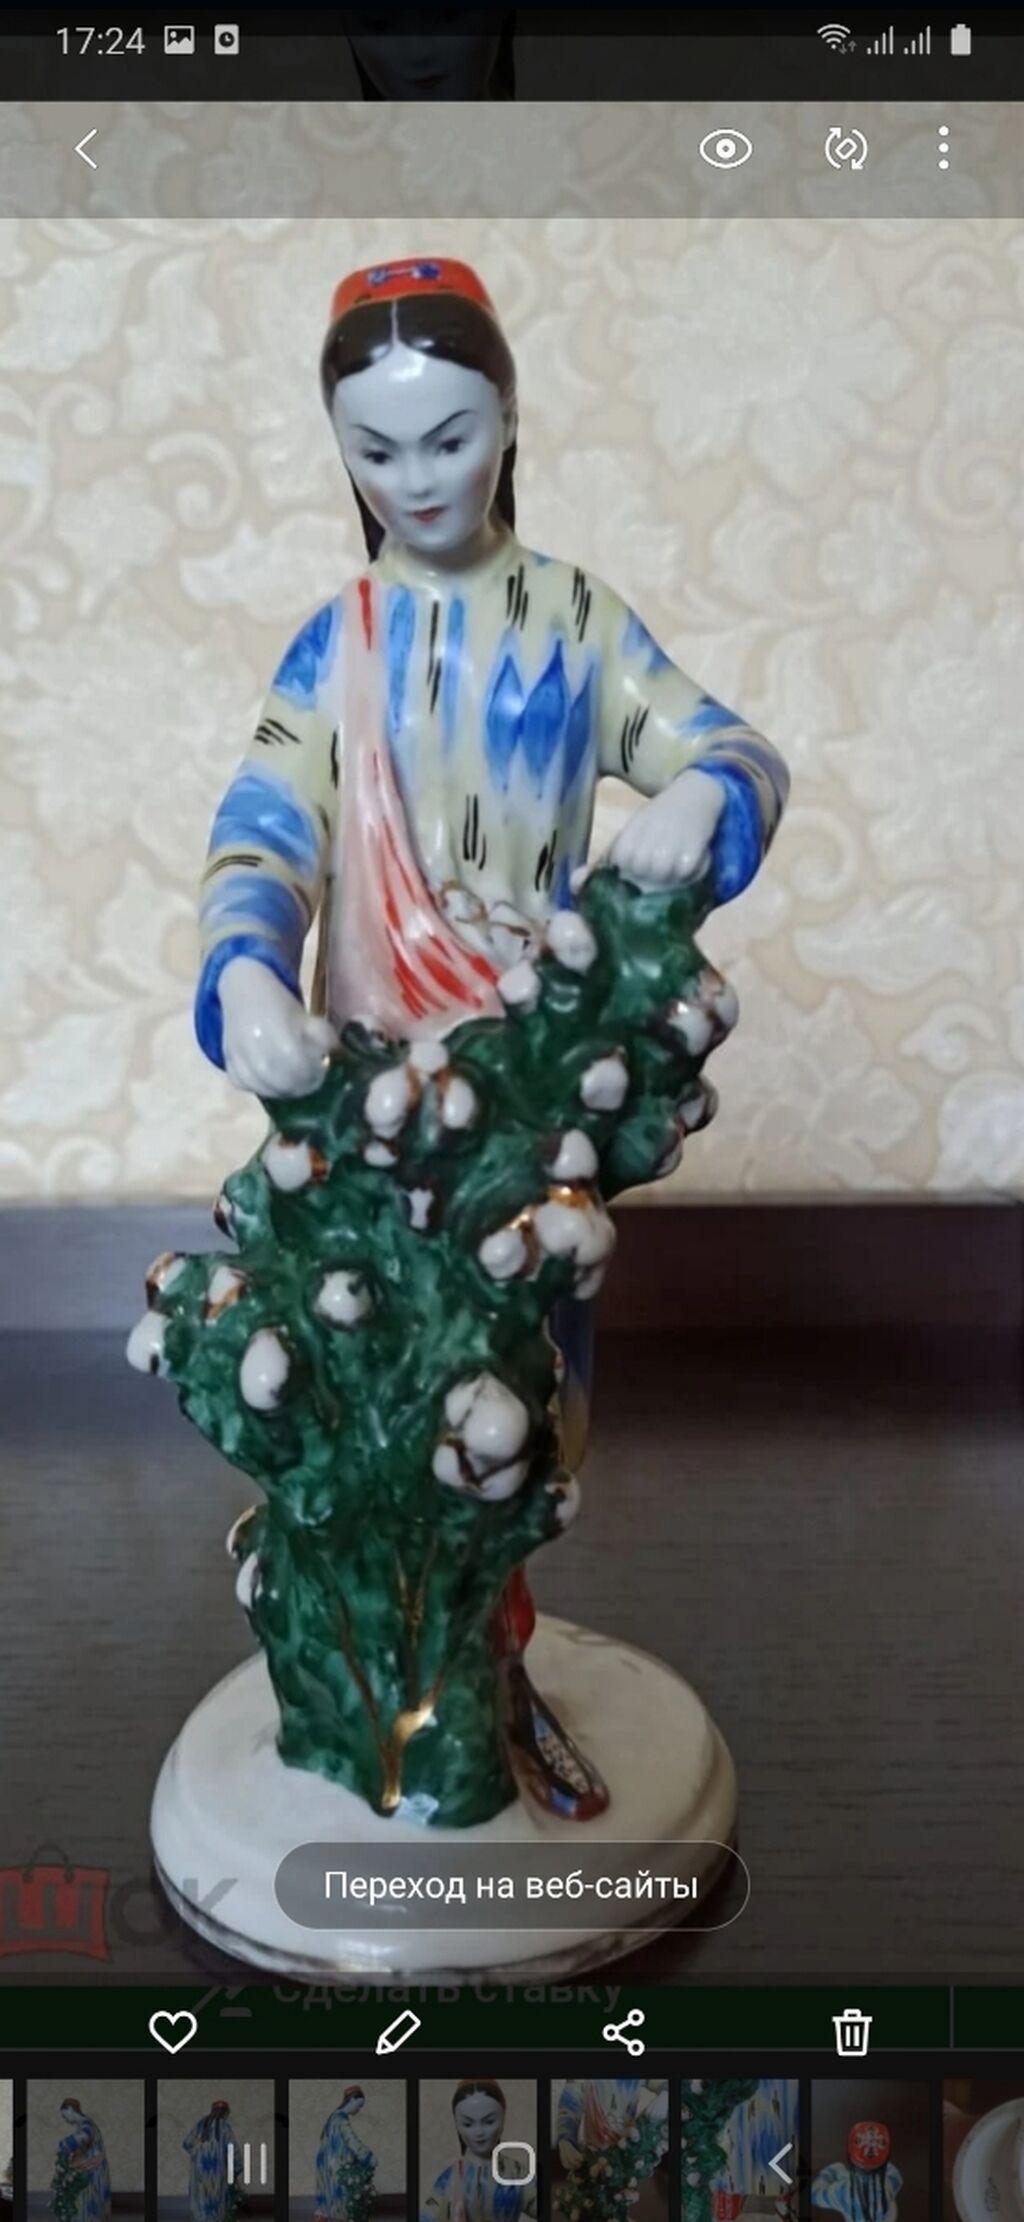 Купим статуэтки: Купим статуэтки